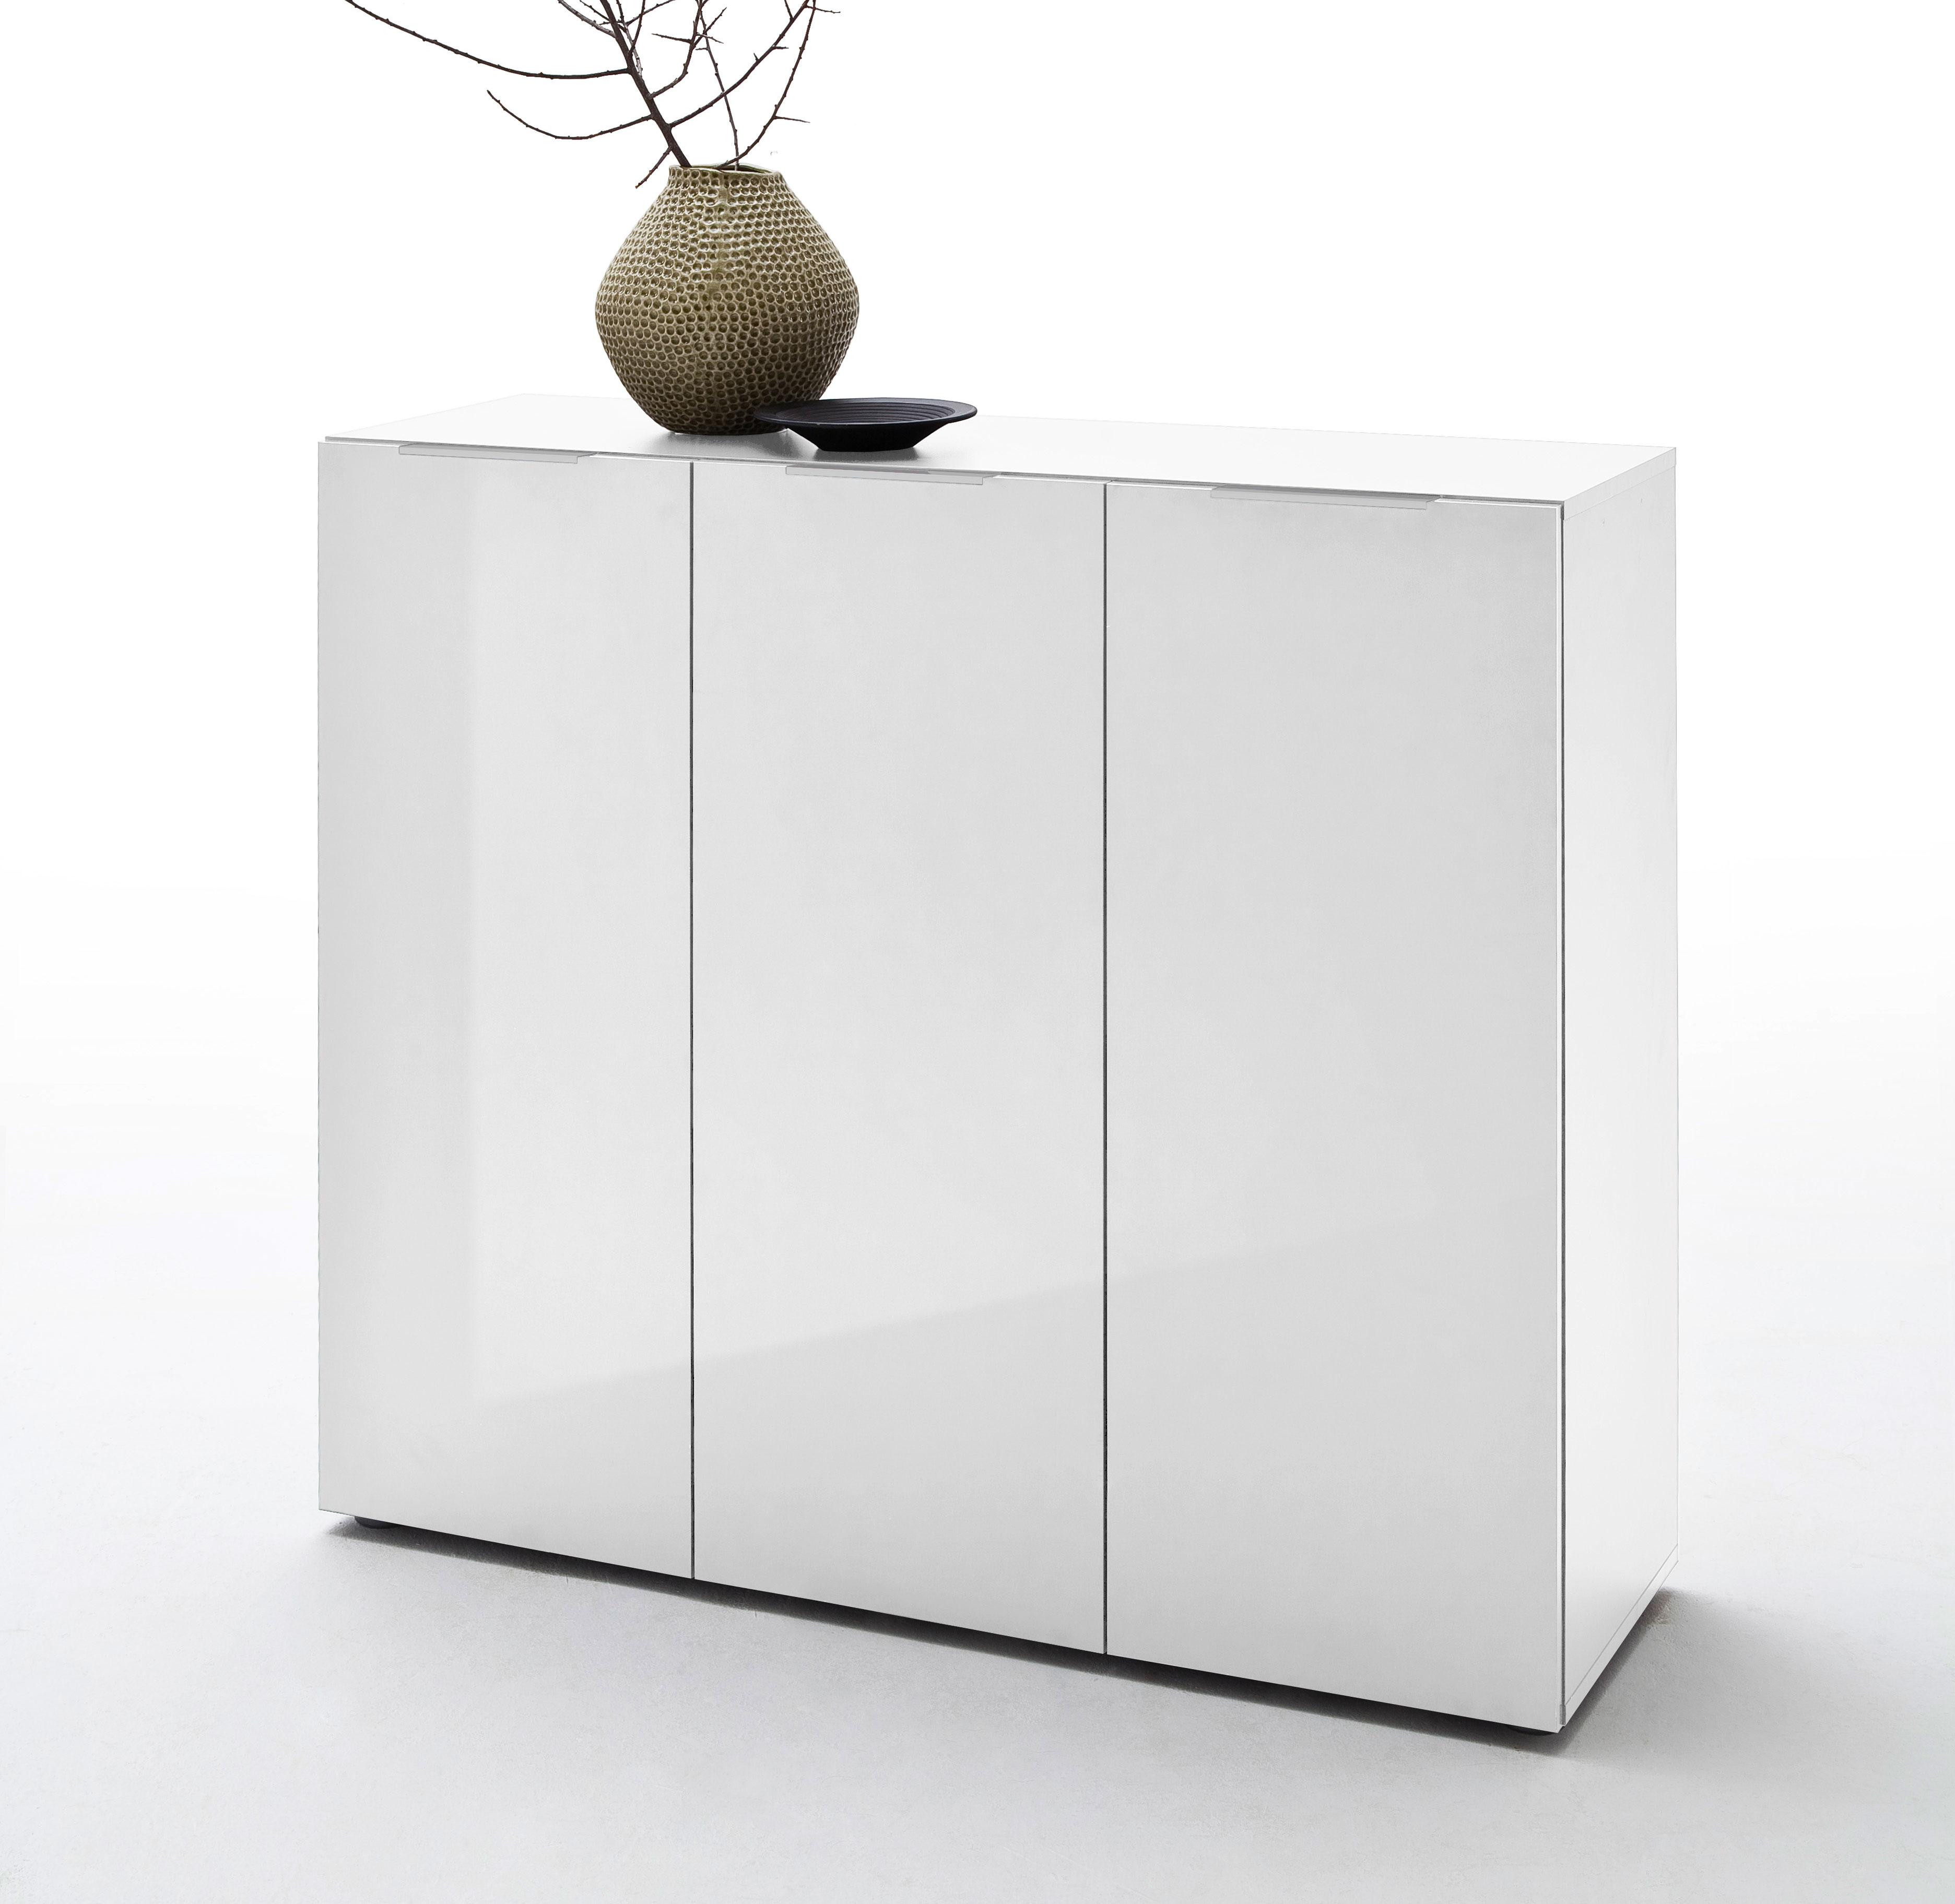 Mca Furniture Garderobe Vicenza Foyer Kommode Mit 3 Turen In